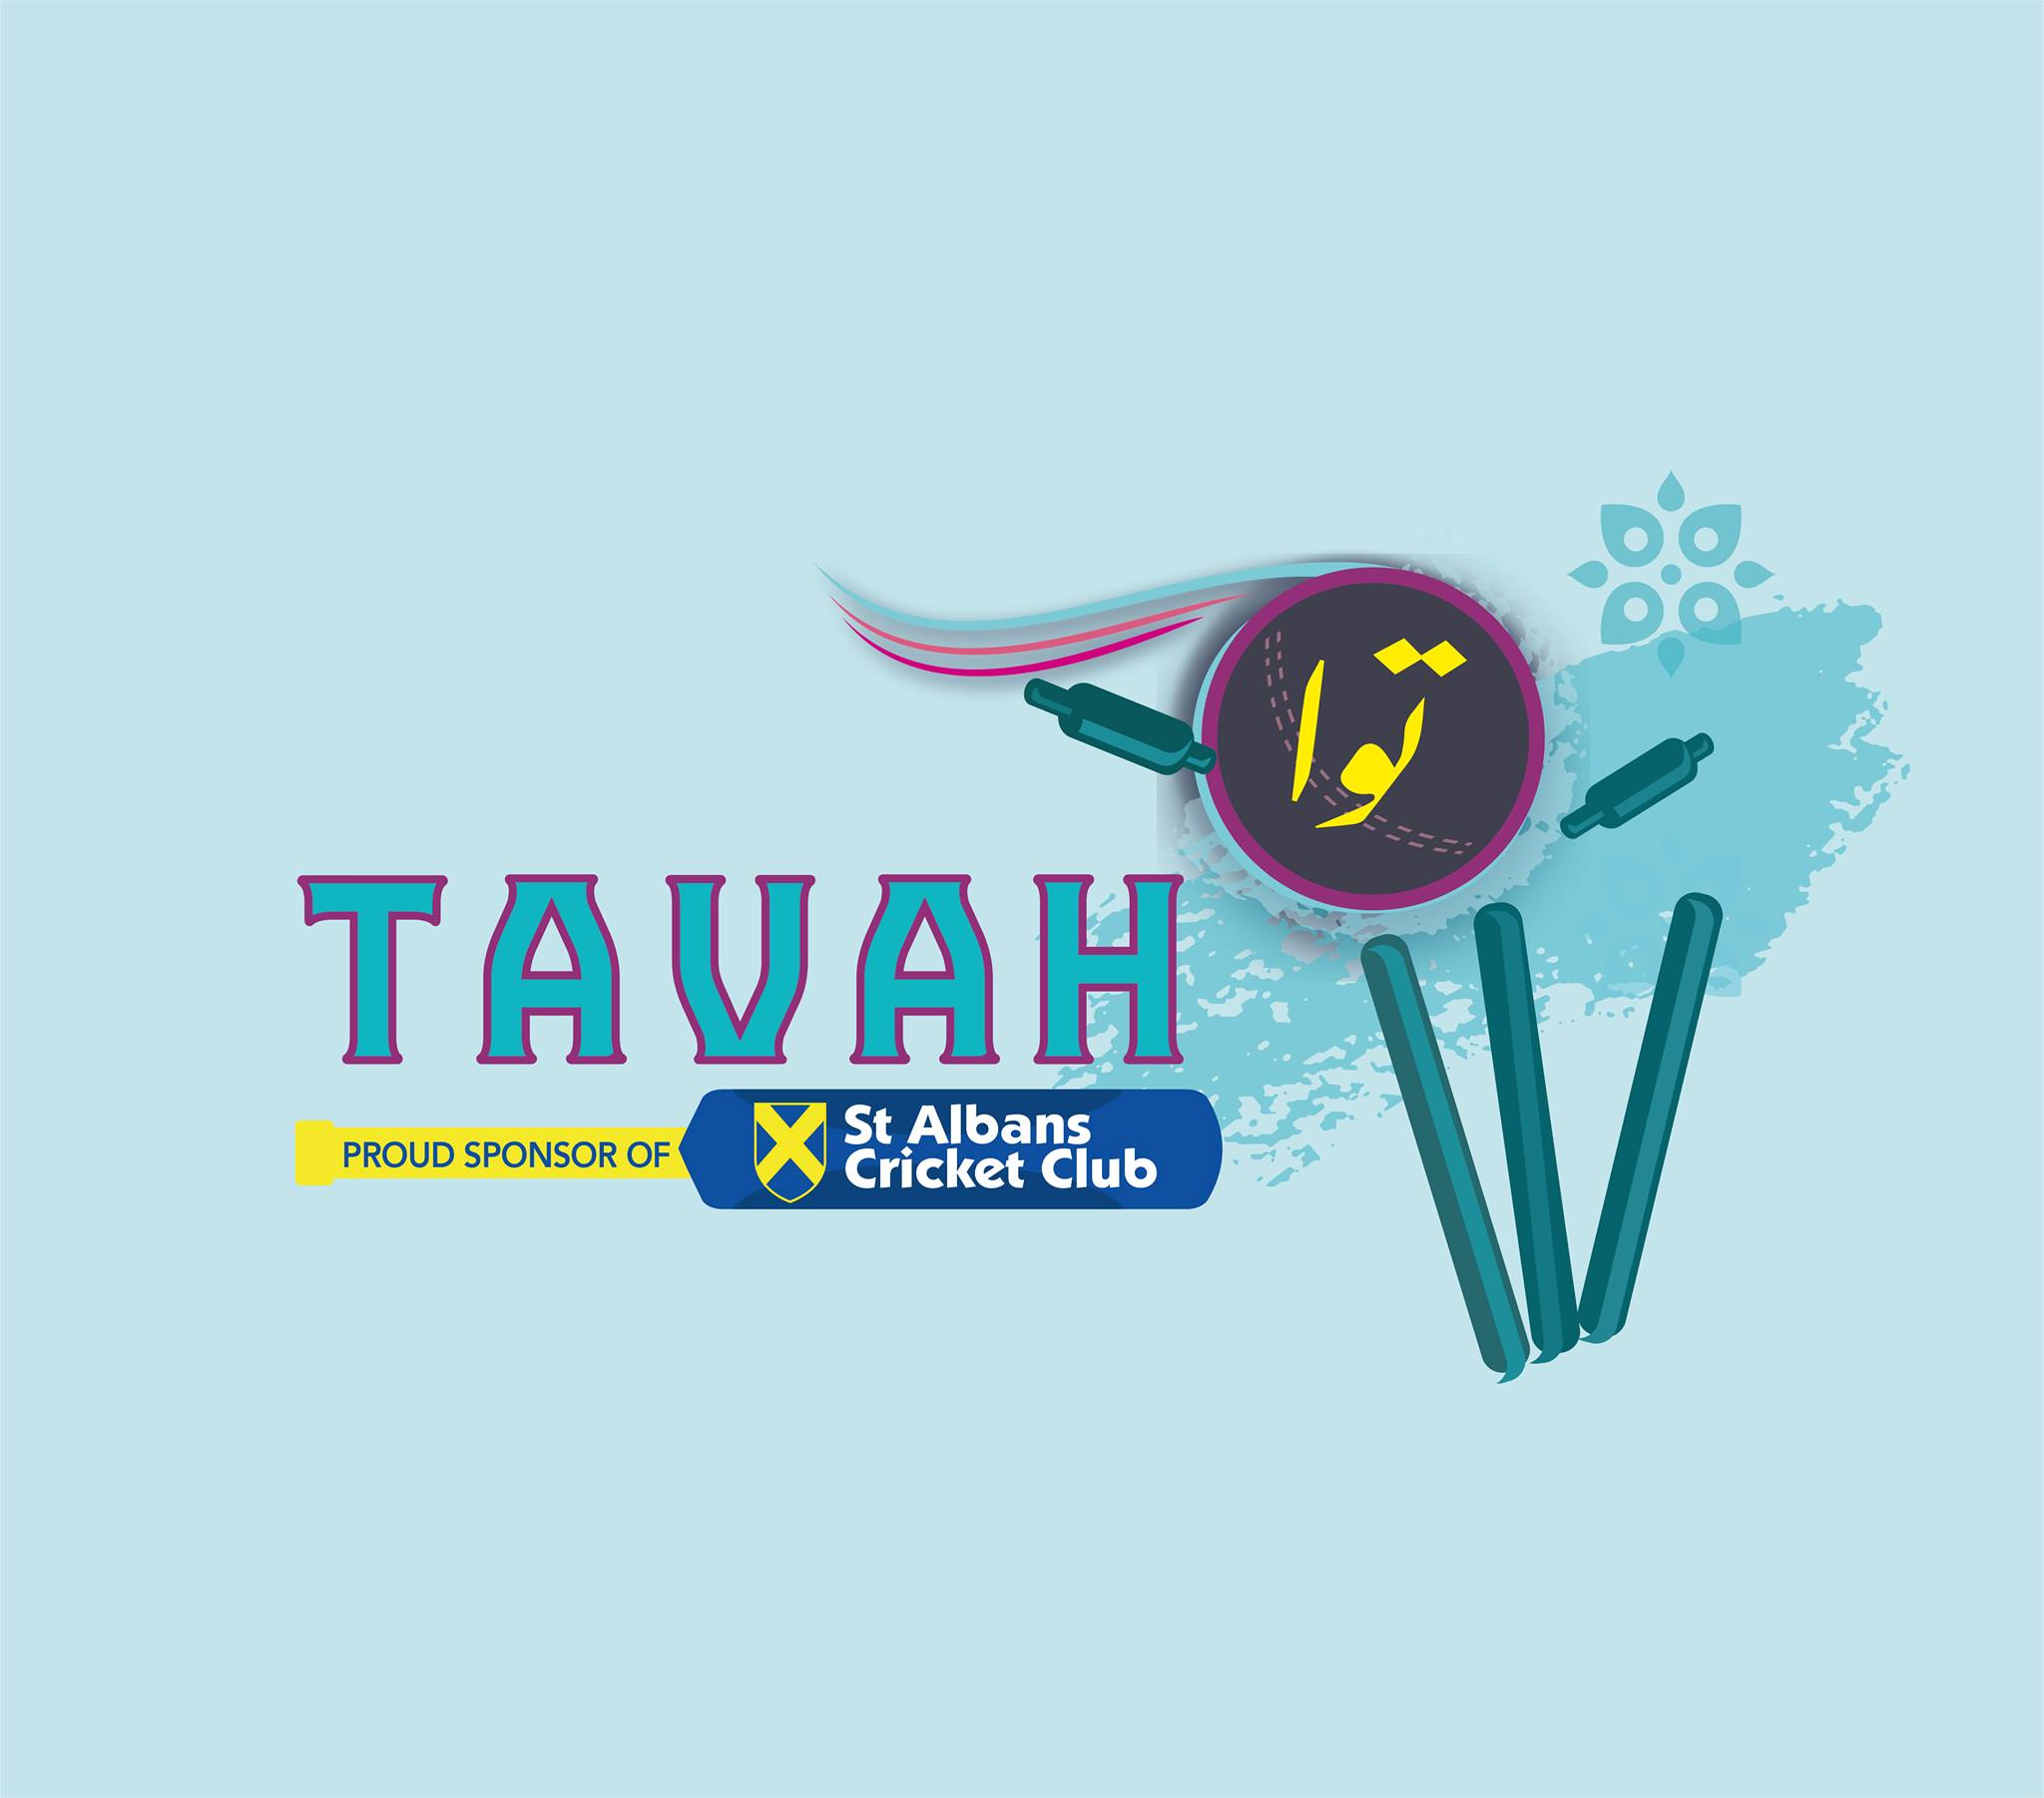 Tavah cricket